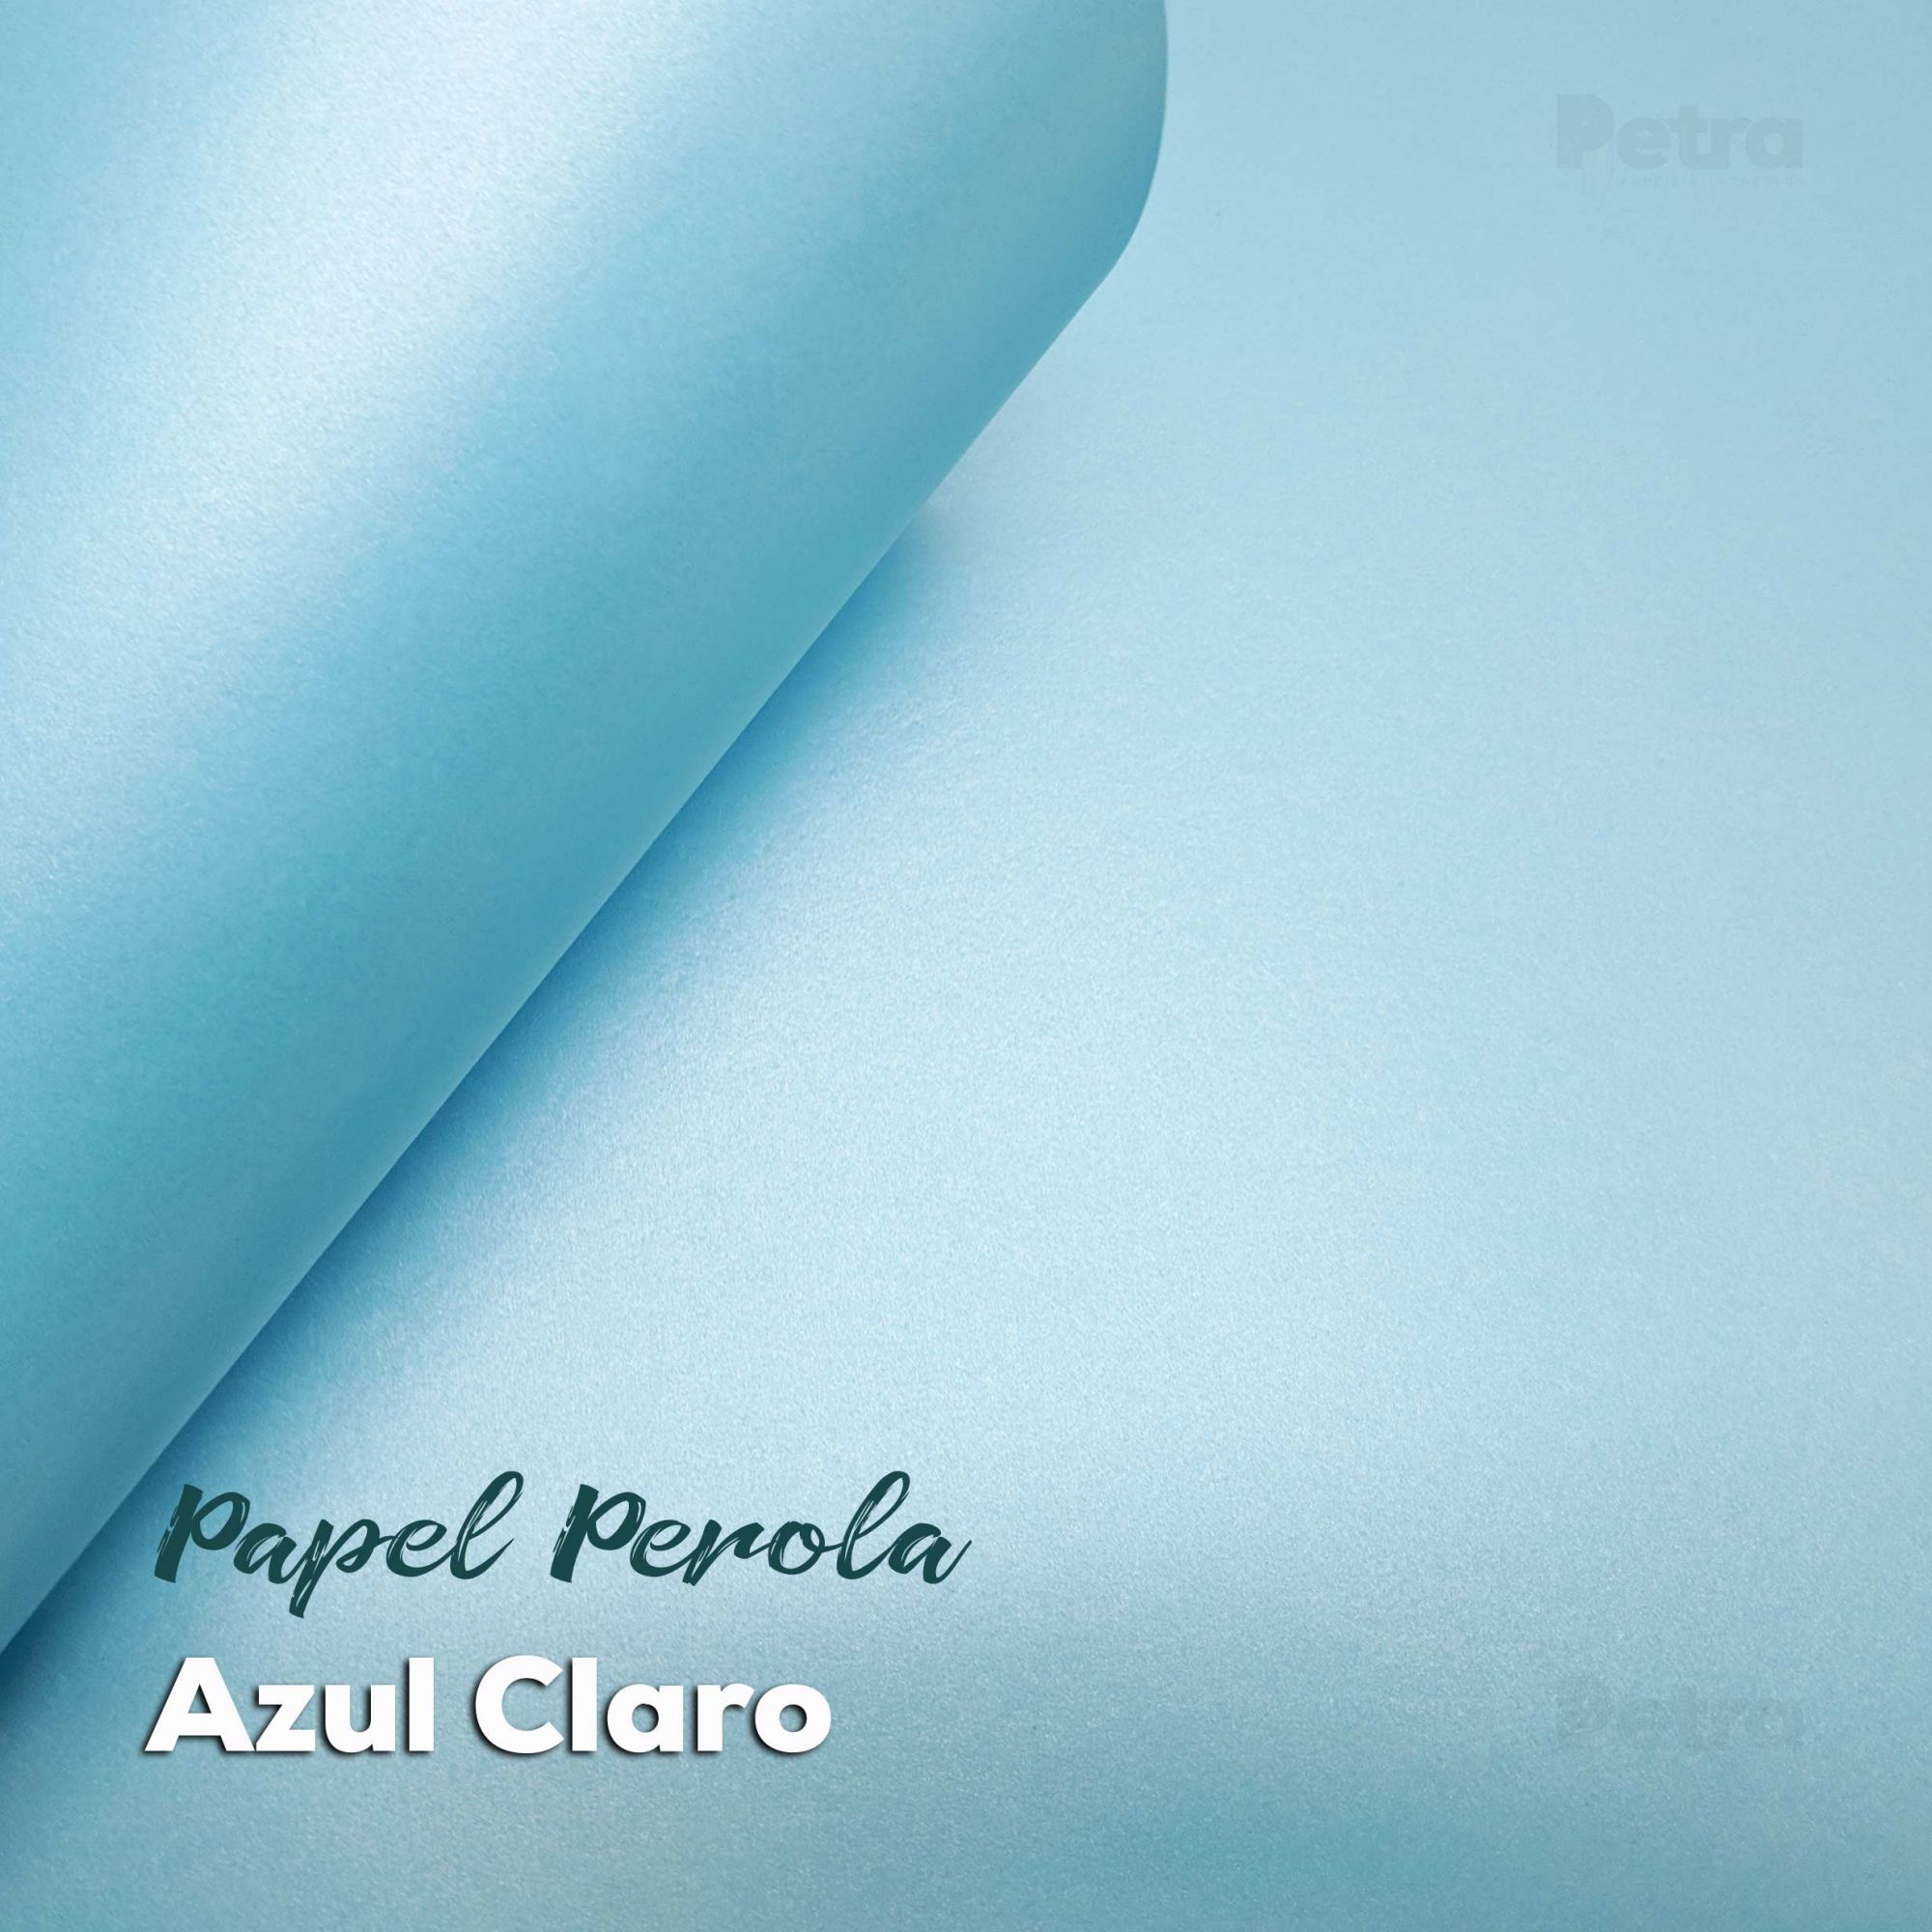 Papel Pérola Azul Claro Tam. 30,5x30,5 - 180g/m²